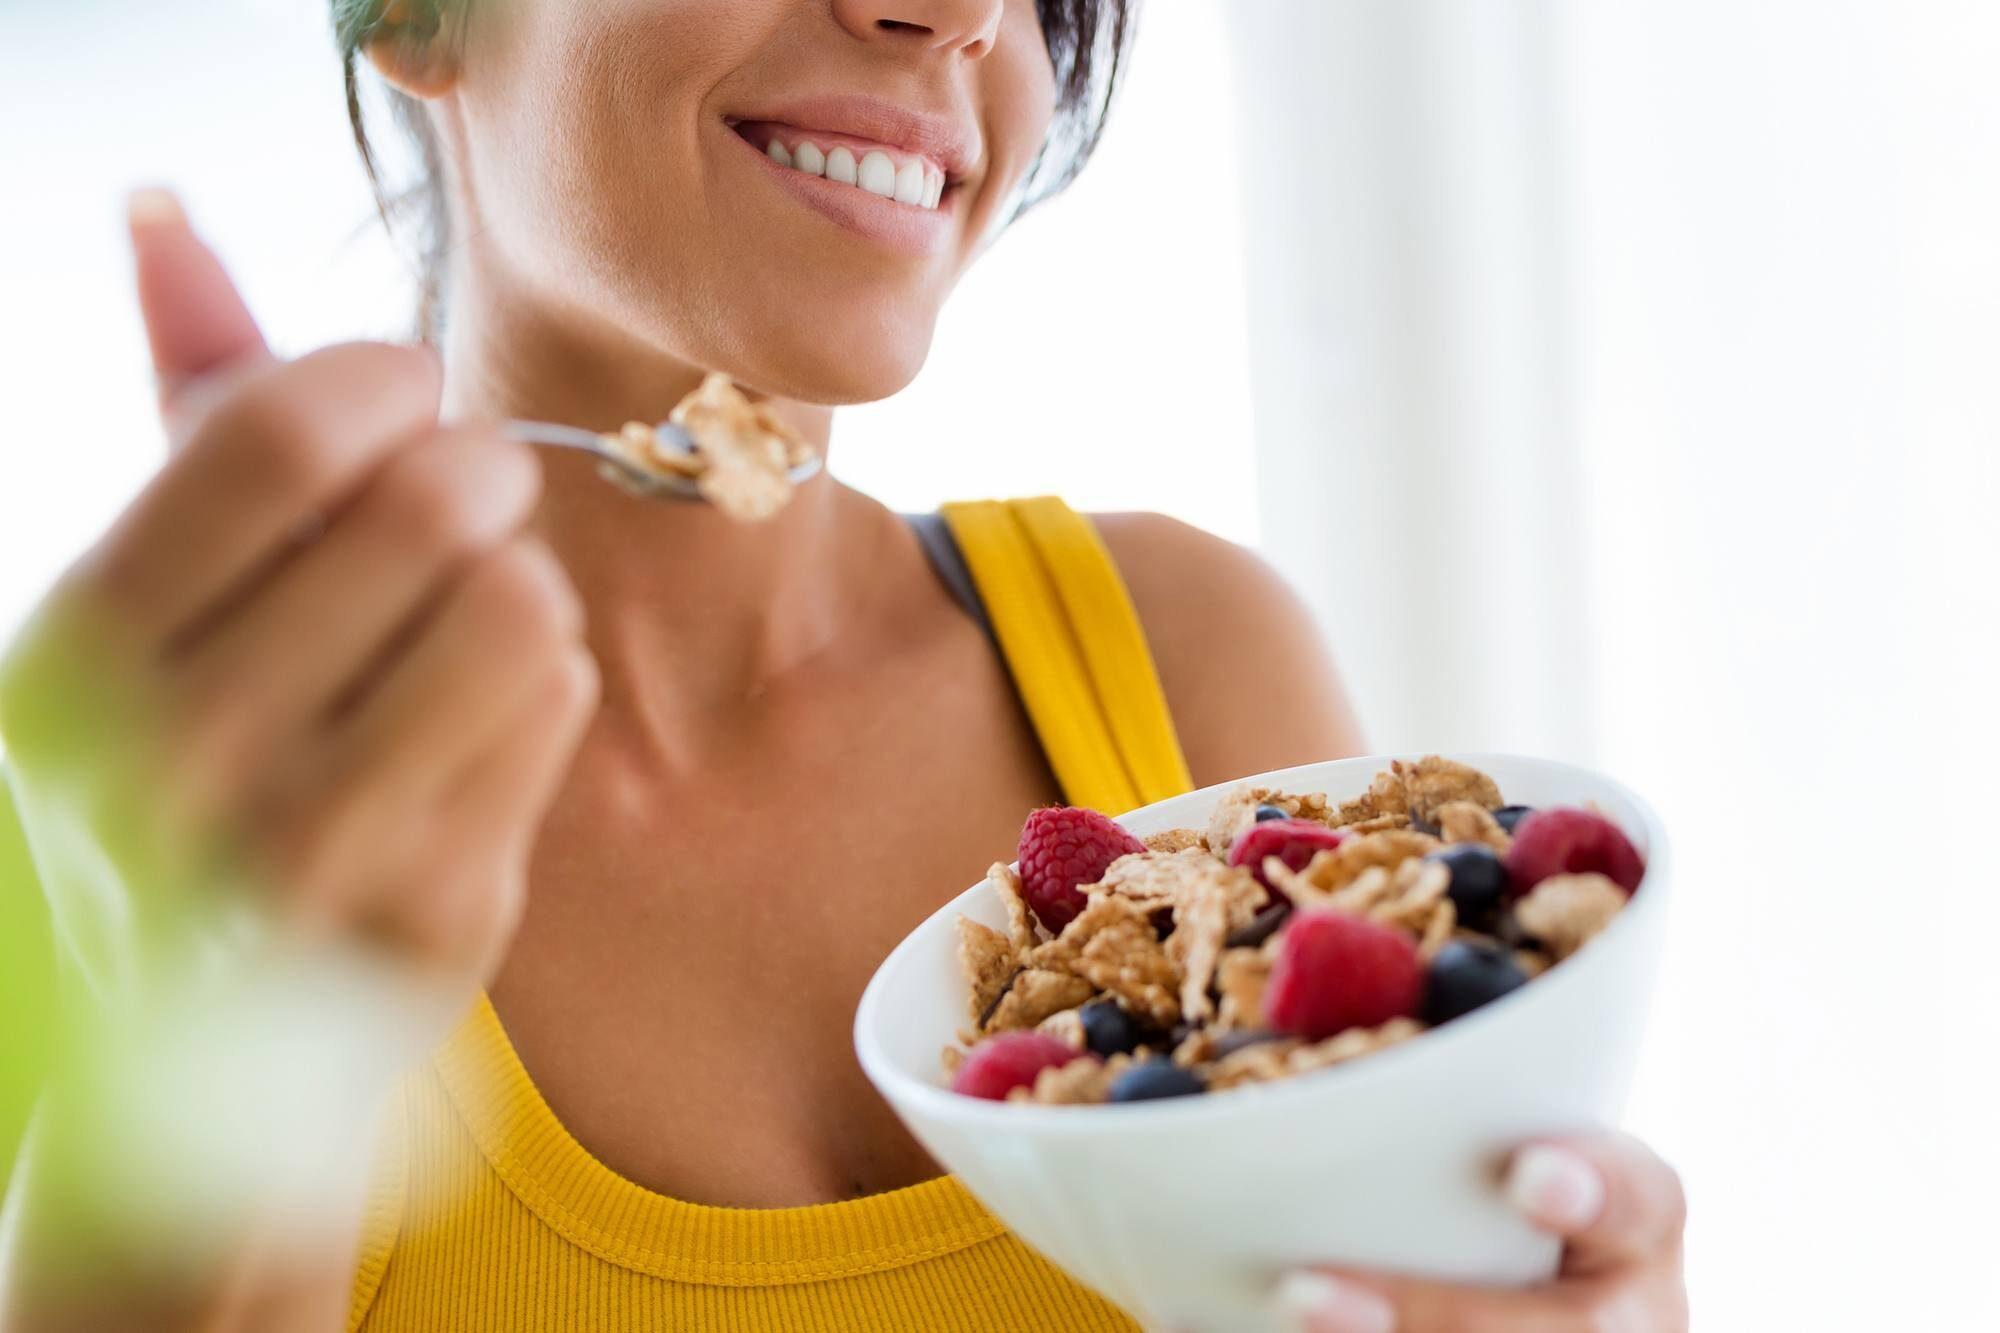 https://www.themaasclinic.com/wp-content/uploads/2020/01/healthy-eating-e1593871854884.jpg